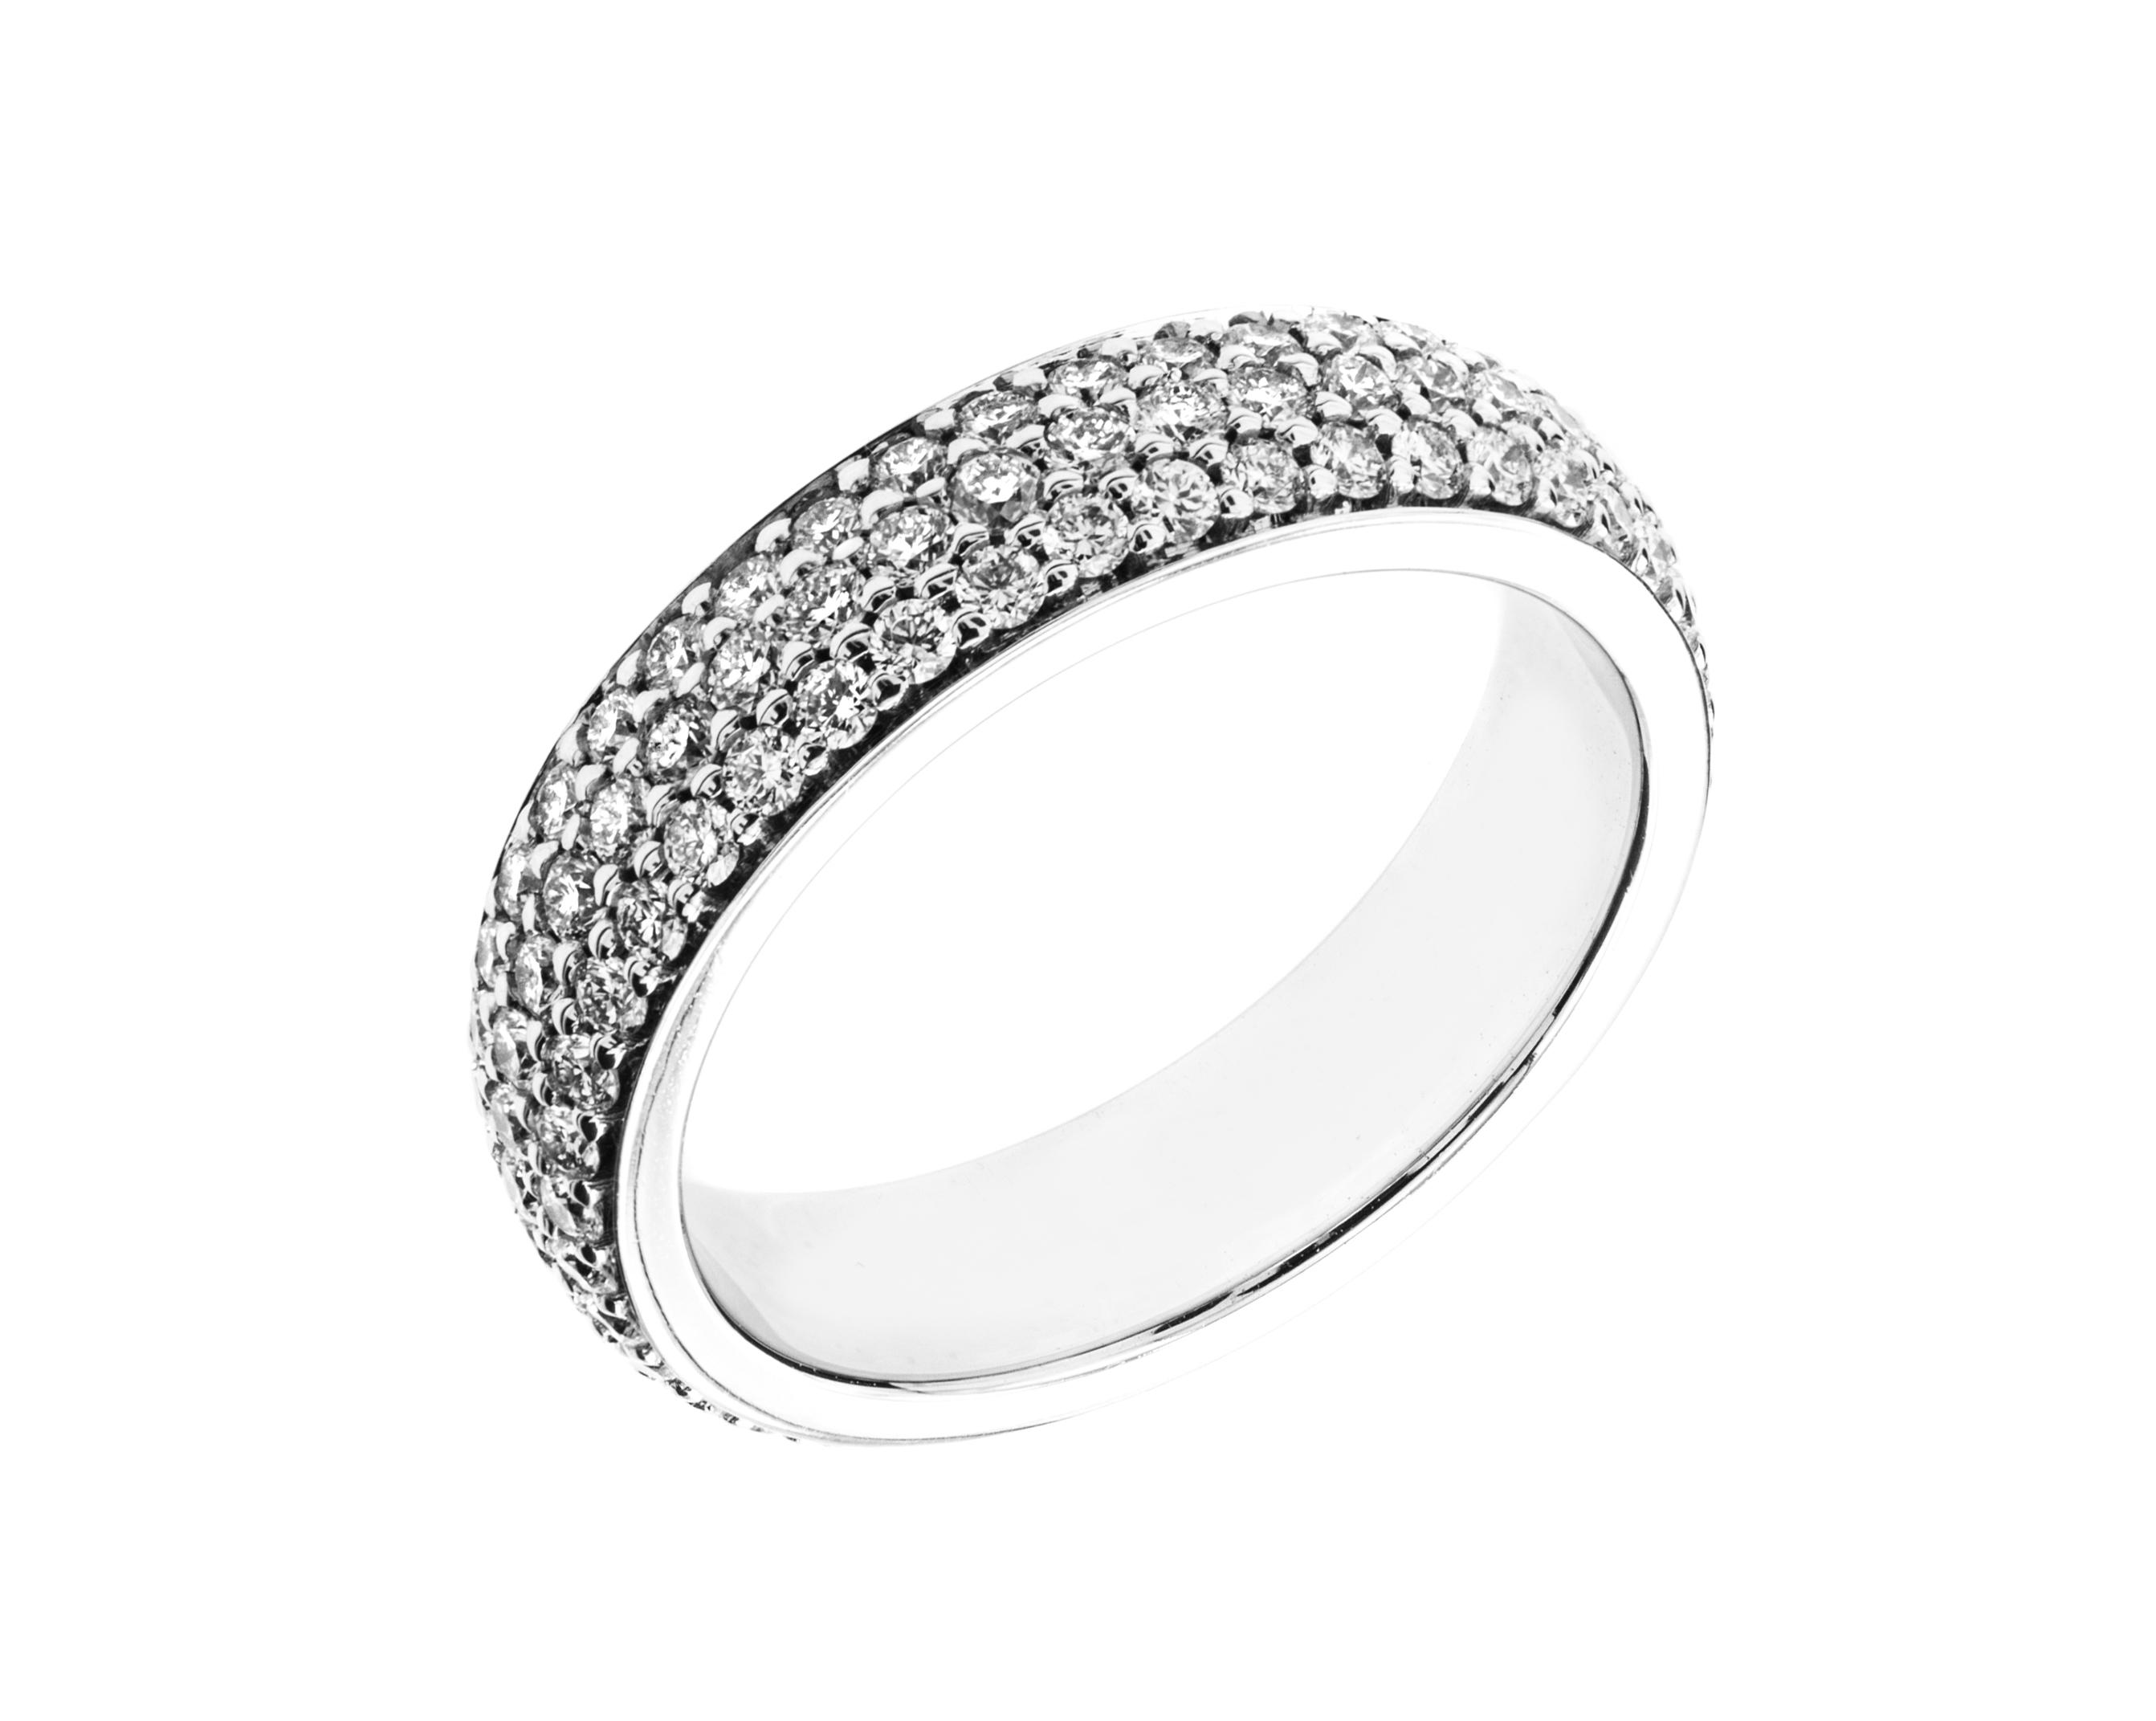 Verigheta cu Diamant/Inel Eternity Dama Aur Alb 18kt cu 3 Randuri de Diamante Mici Rotund Briliant in Setare Gheare-img1